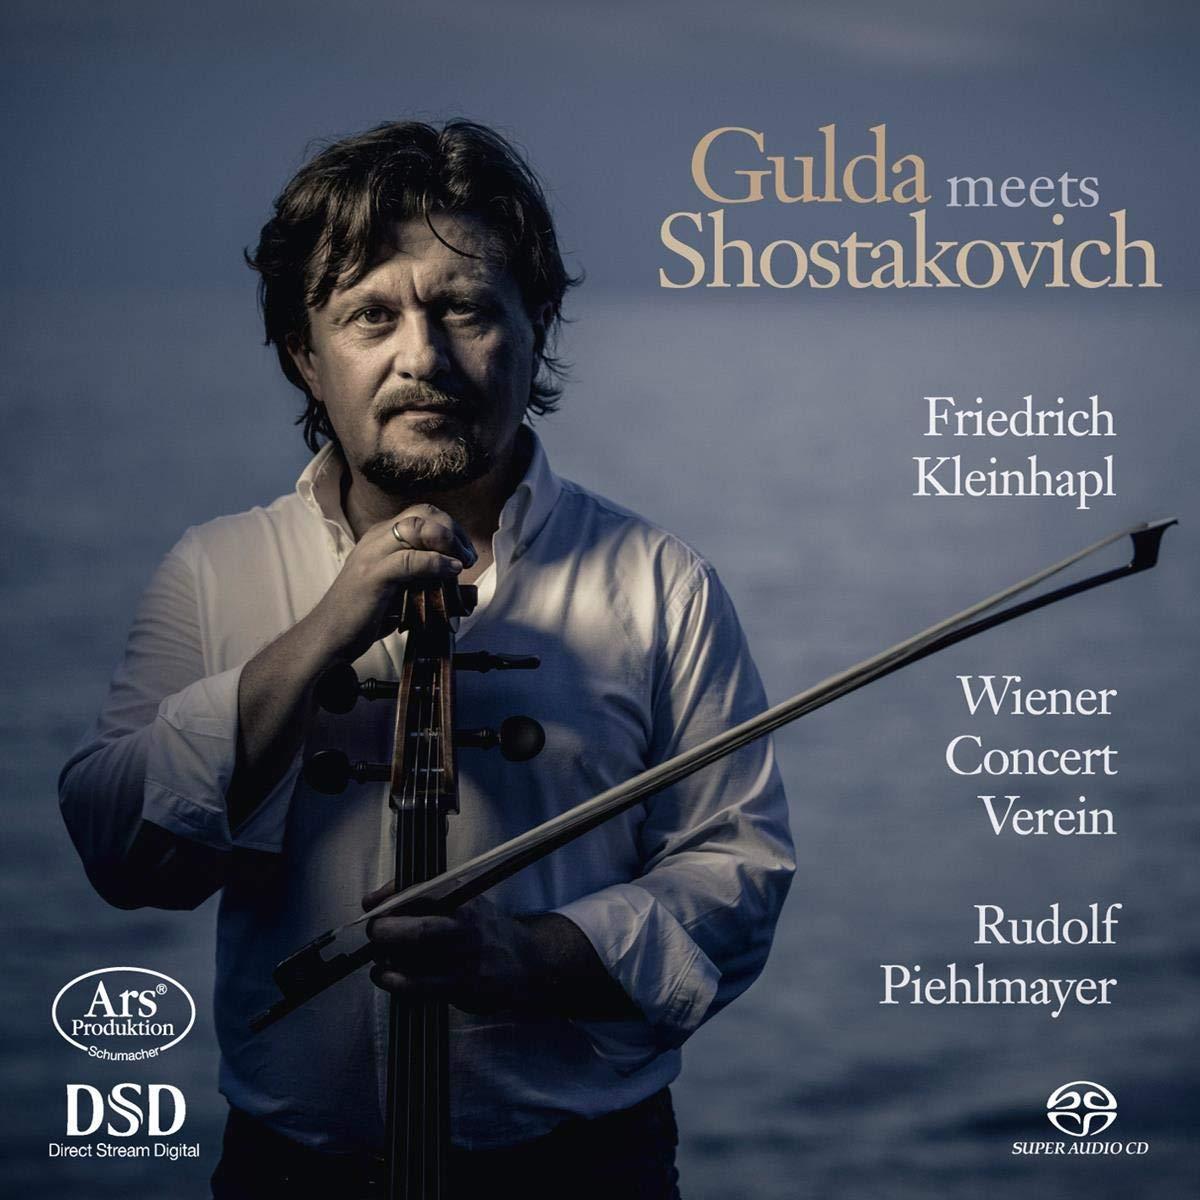 SACD : FRIEDRICH KLEINHAPL - Gulda Meets Shostakovich (Hybrid SACD)